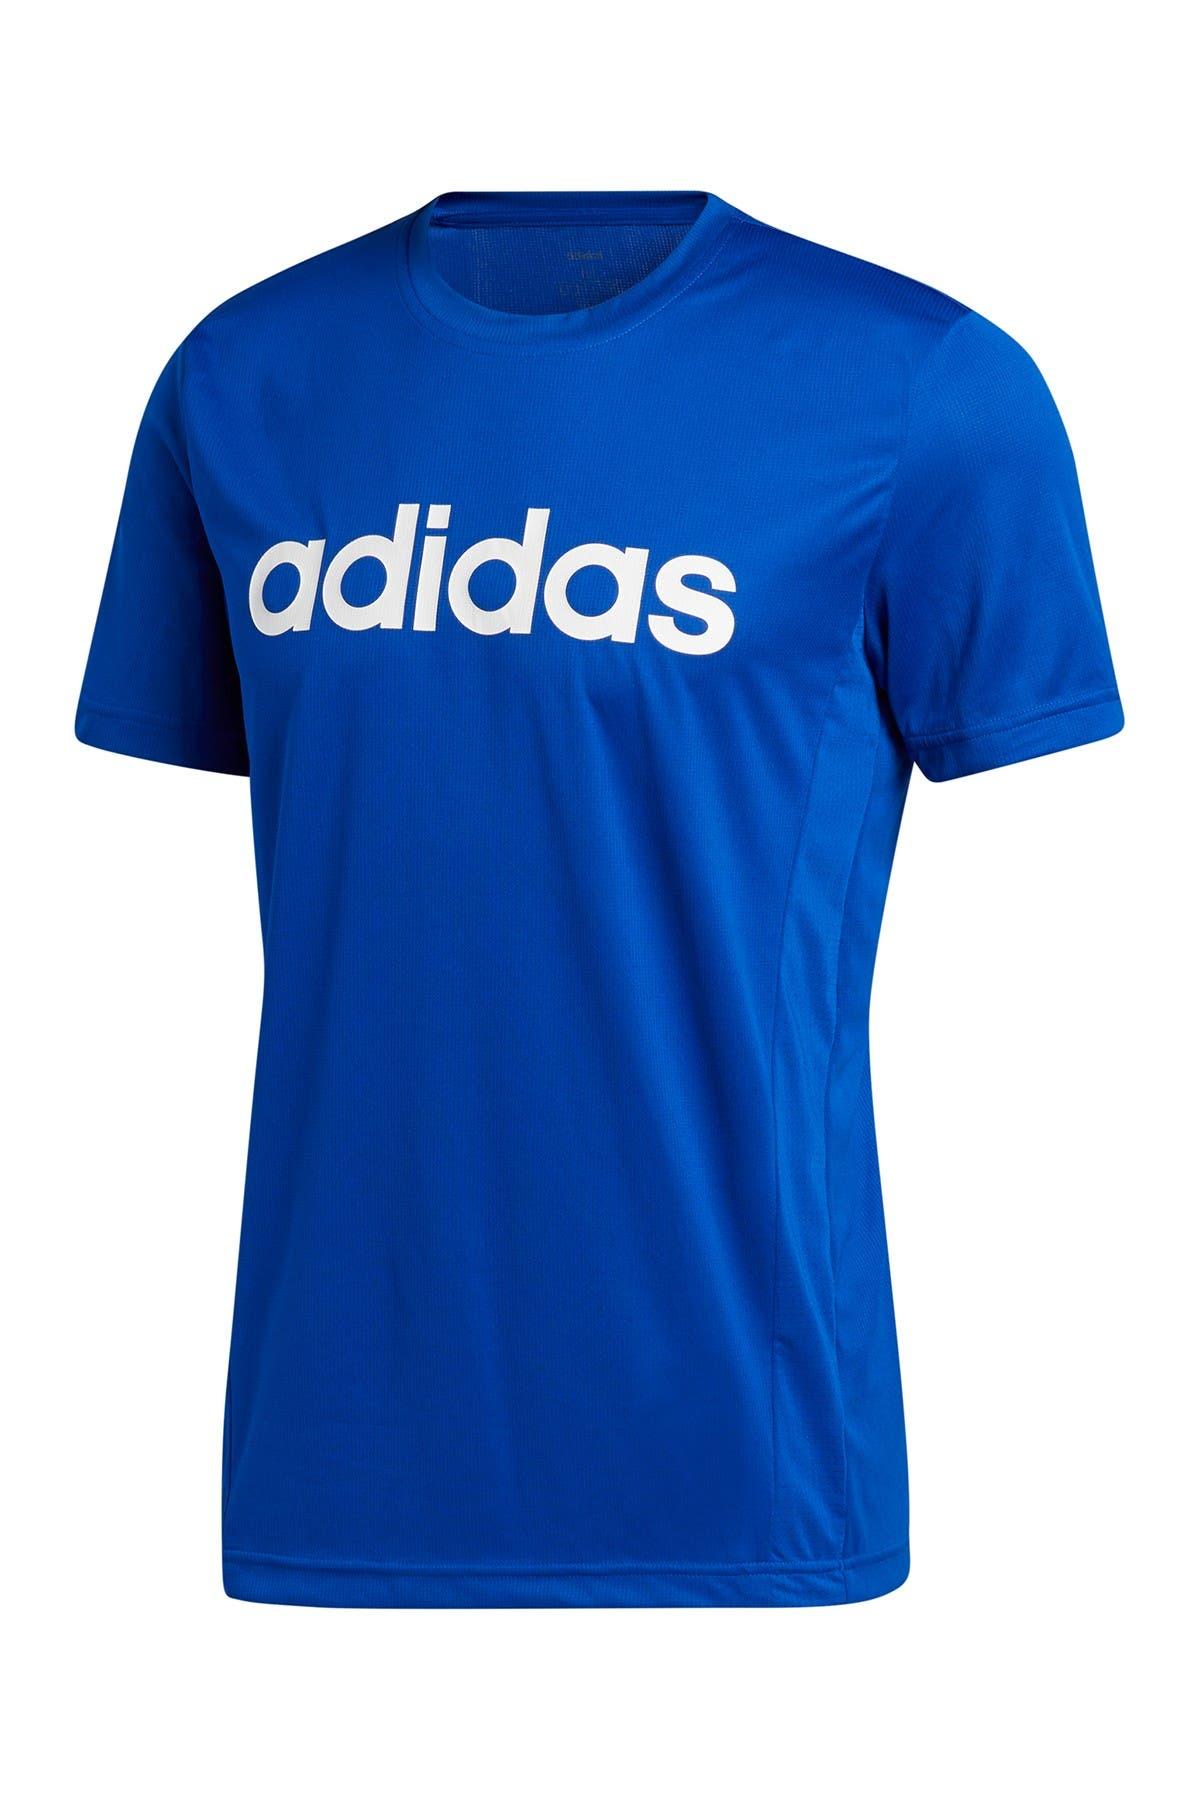 Image of adidas Designed To Move Logo T-Shirt